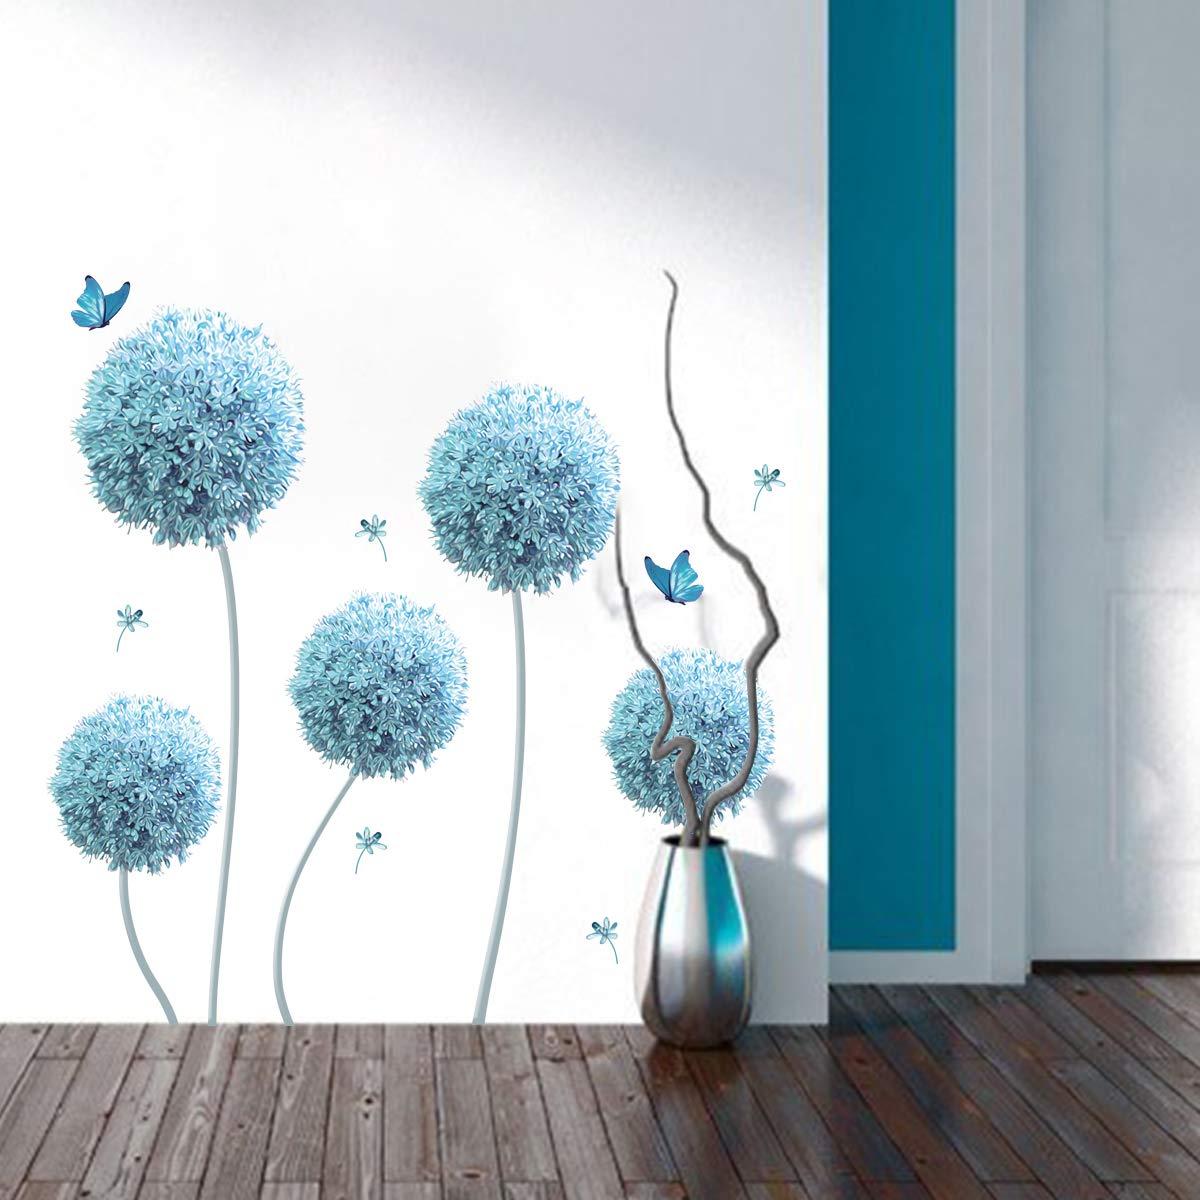 decalmile Pegatinas de Pared Allium Azul Vinilos Decorativos Flores Mariposa Adhesivos Pared Infantiles Habitaci/ón Sal/ón Dormitorio